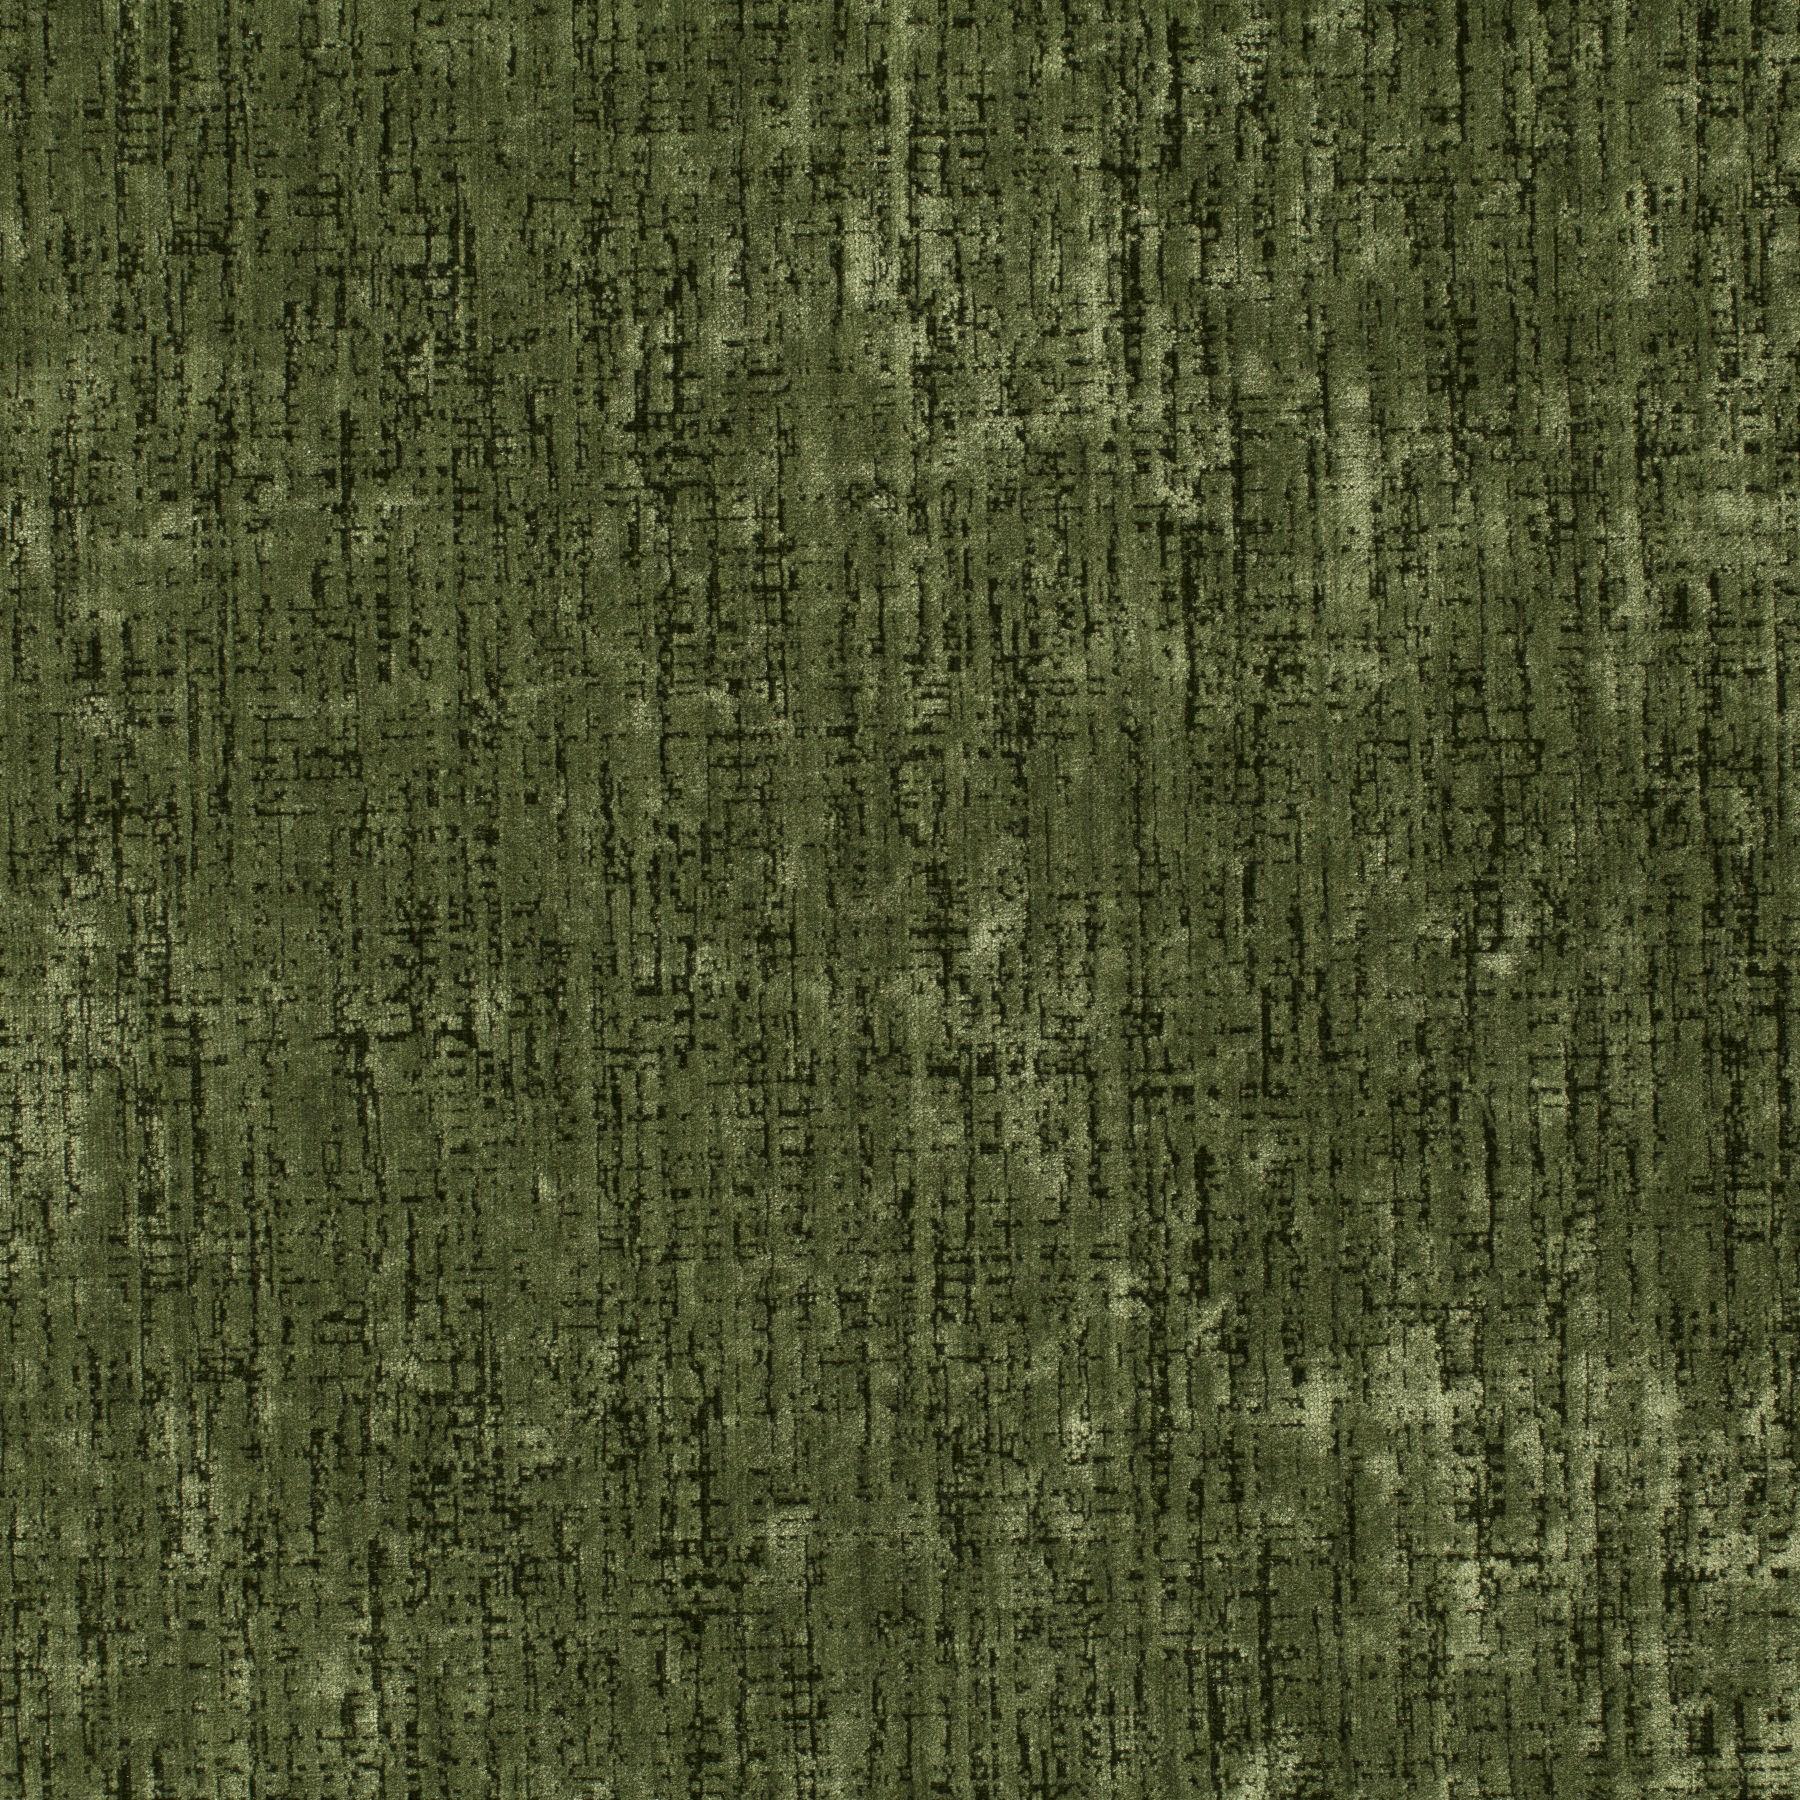 upholstery fabric valentina velvet ca1404 032 jab anstoetz